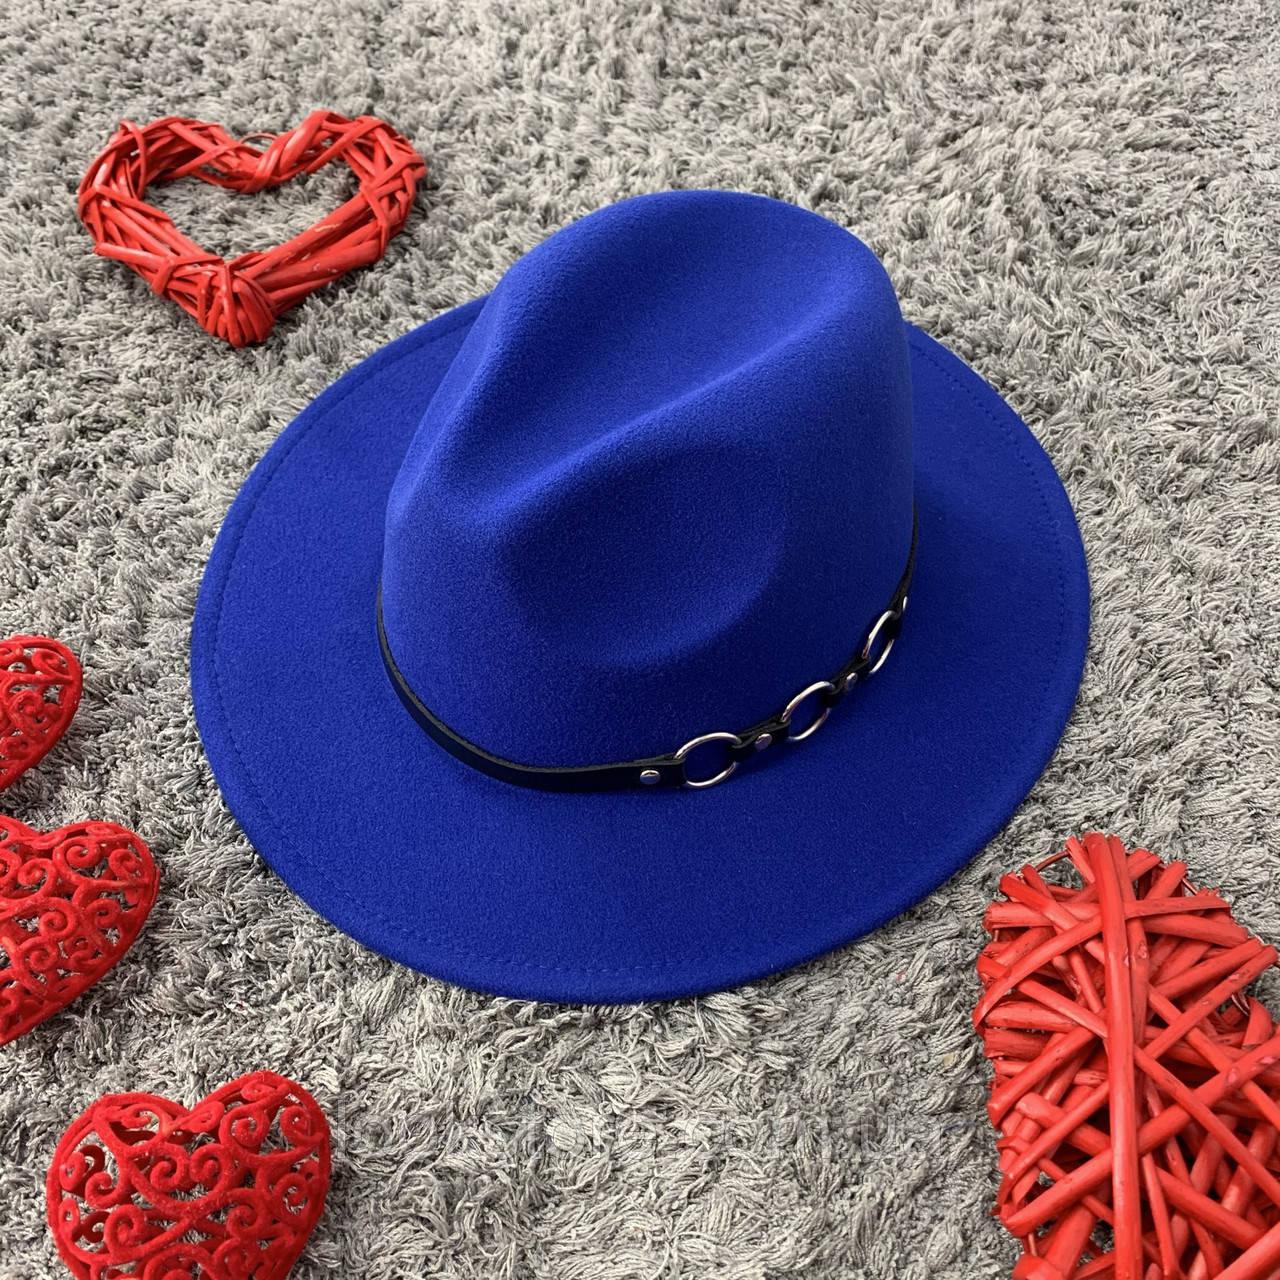 Шляпа Федора унисекс с устойчивыми полями Rings синяя (электрик)